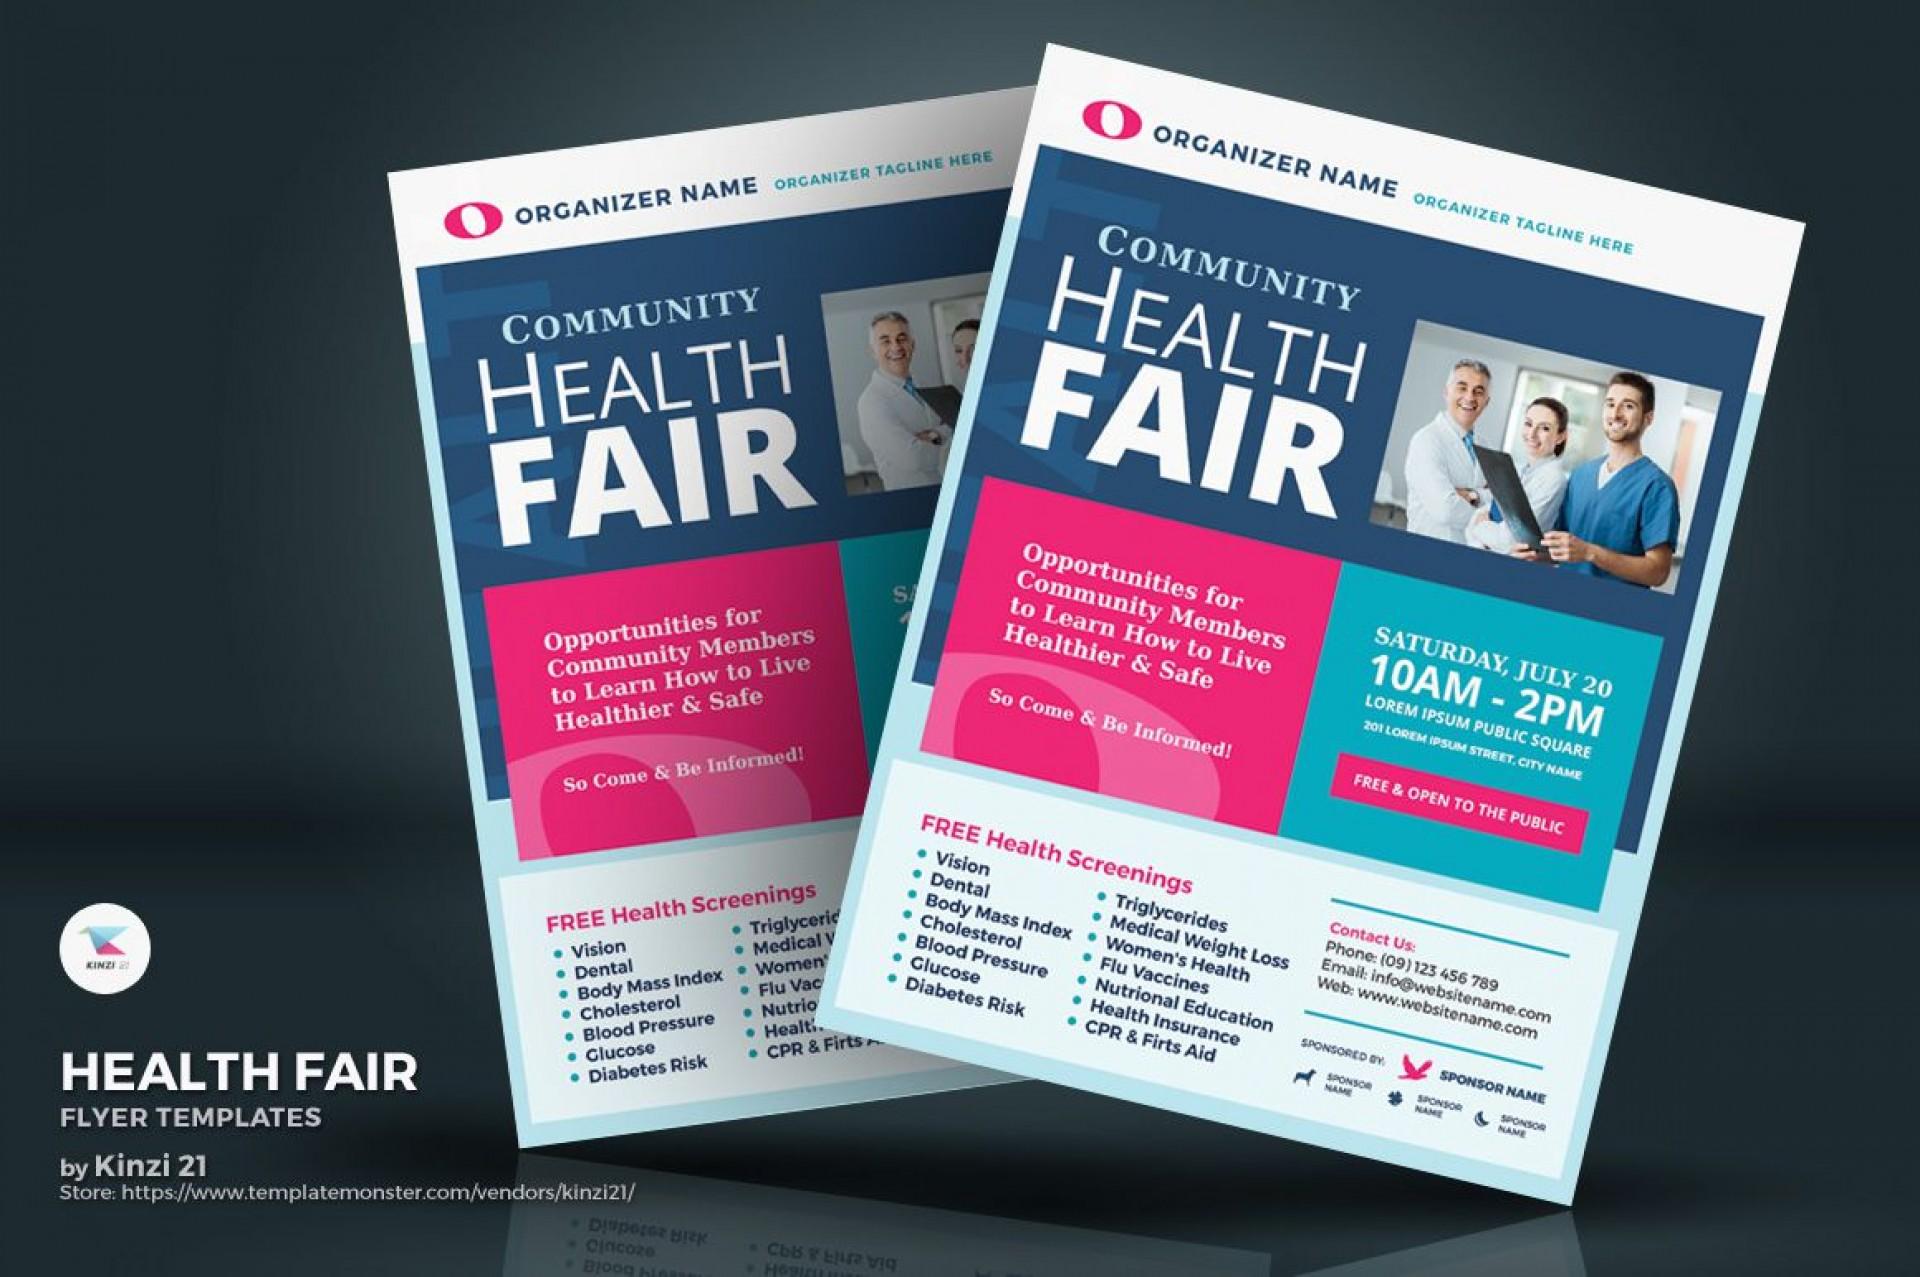 006 Unique Health Fair Flyer Template Free Inspiration  Download1920